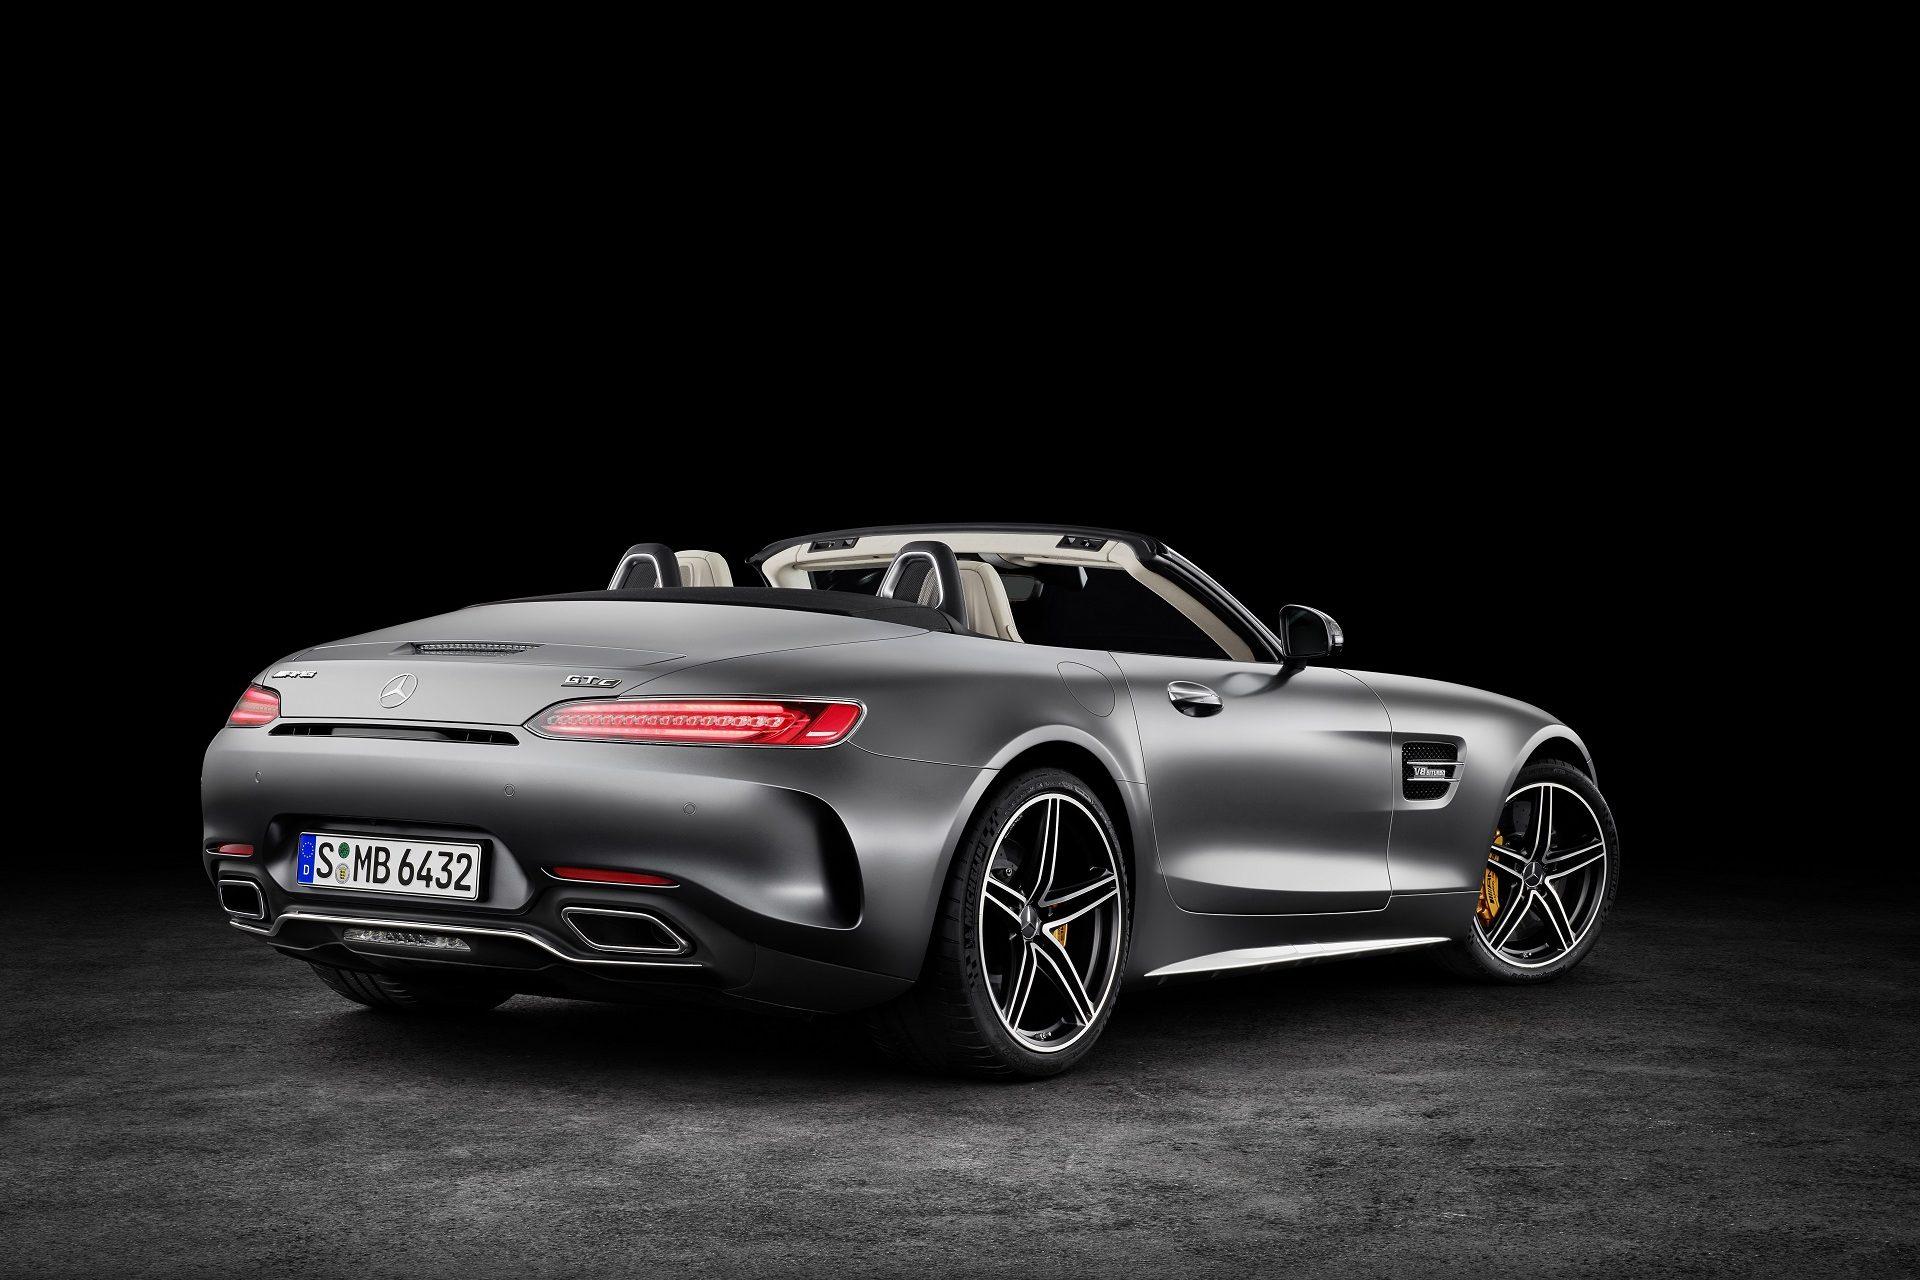 AMG GT C Roadster (R 190), 2016; Exterieur: designo selenitgrau magno; Interieur: Leder Nappa Exklusiv macchiatobeige; Kraftstoffverbrauch kombiniert: xx.x l/100 km, CO2-Emissionen kombiniert: xxx g/km//AMG GT C Roadster (R 190), 2016; exterior: designo selenit grey magno; interior:Nappa leather exclusive macchiato beige; fuel consumption, combined: xx,x l/100 km; combined CO2 emissions: xxx g/km